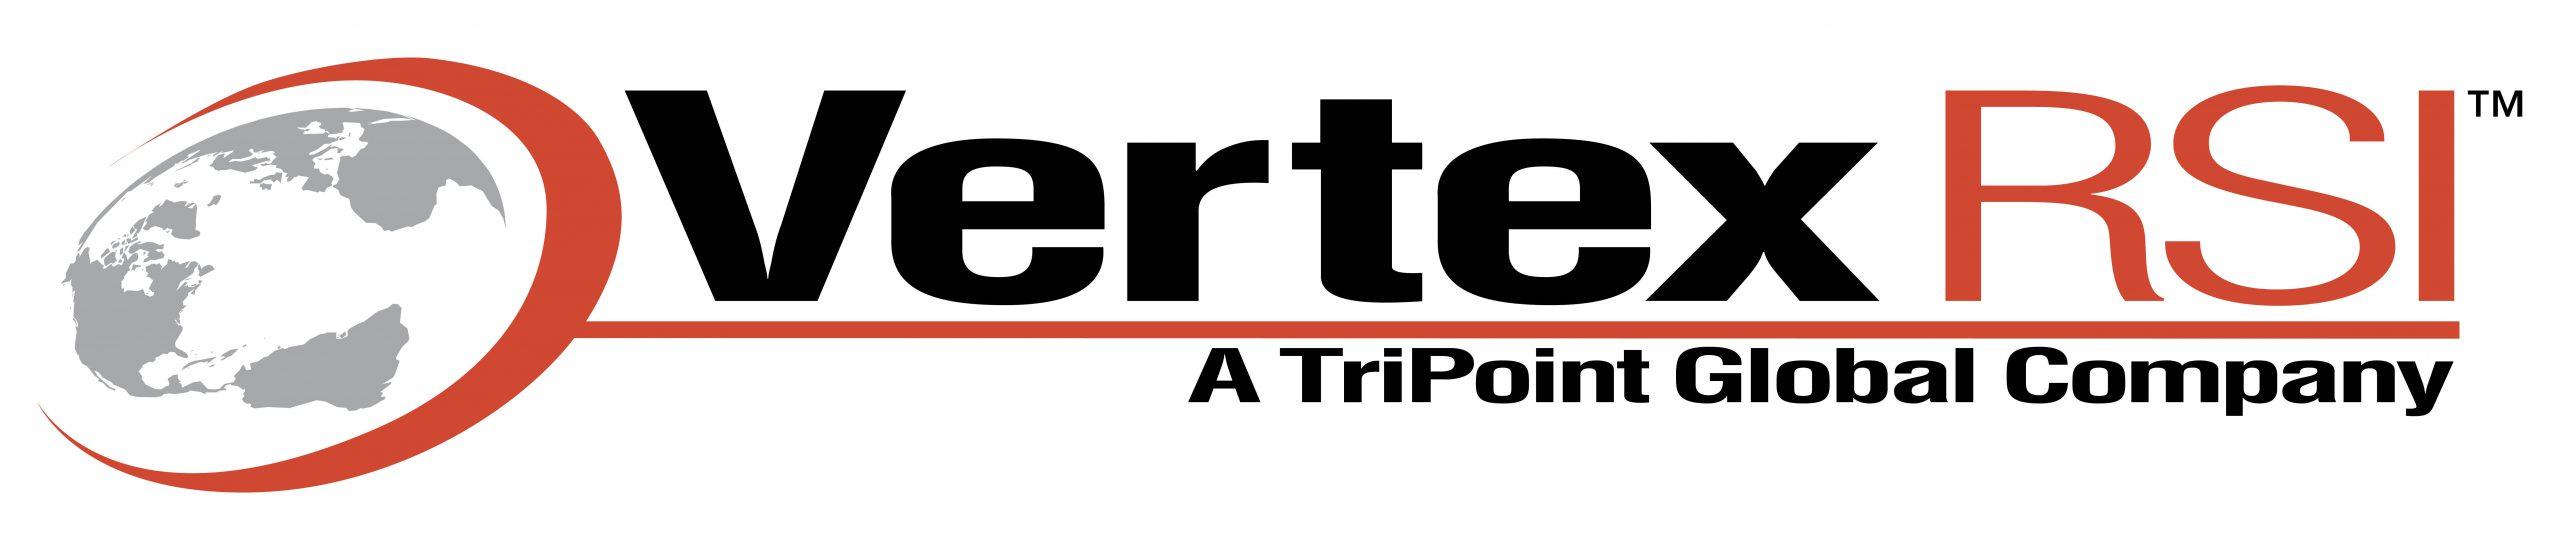 VertexRSI